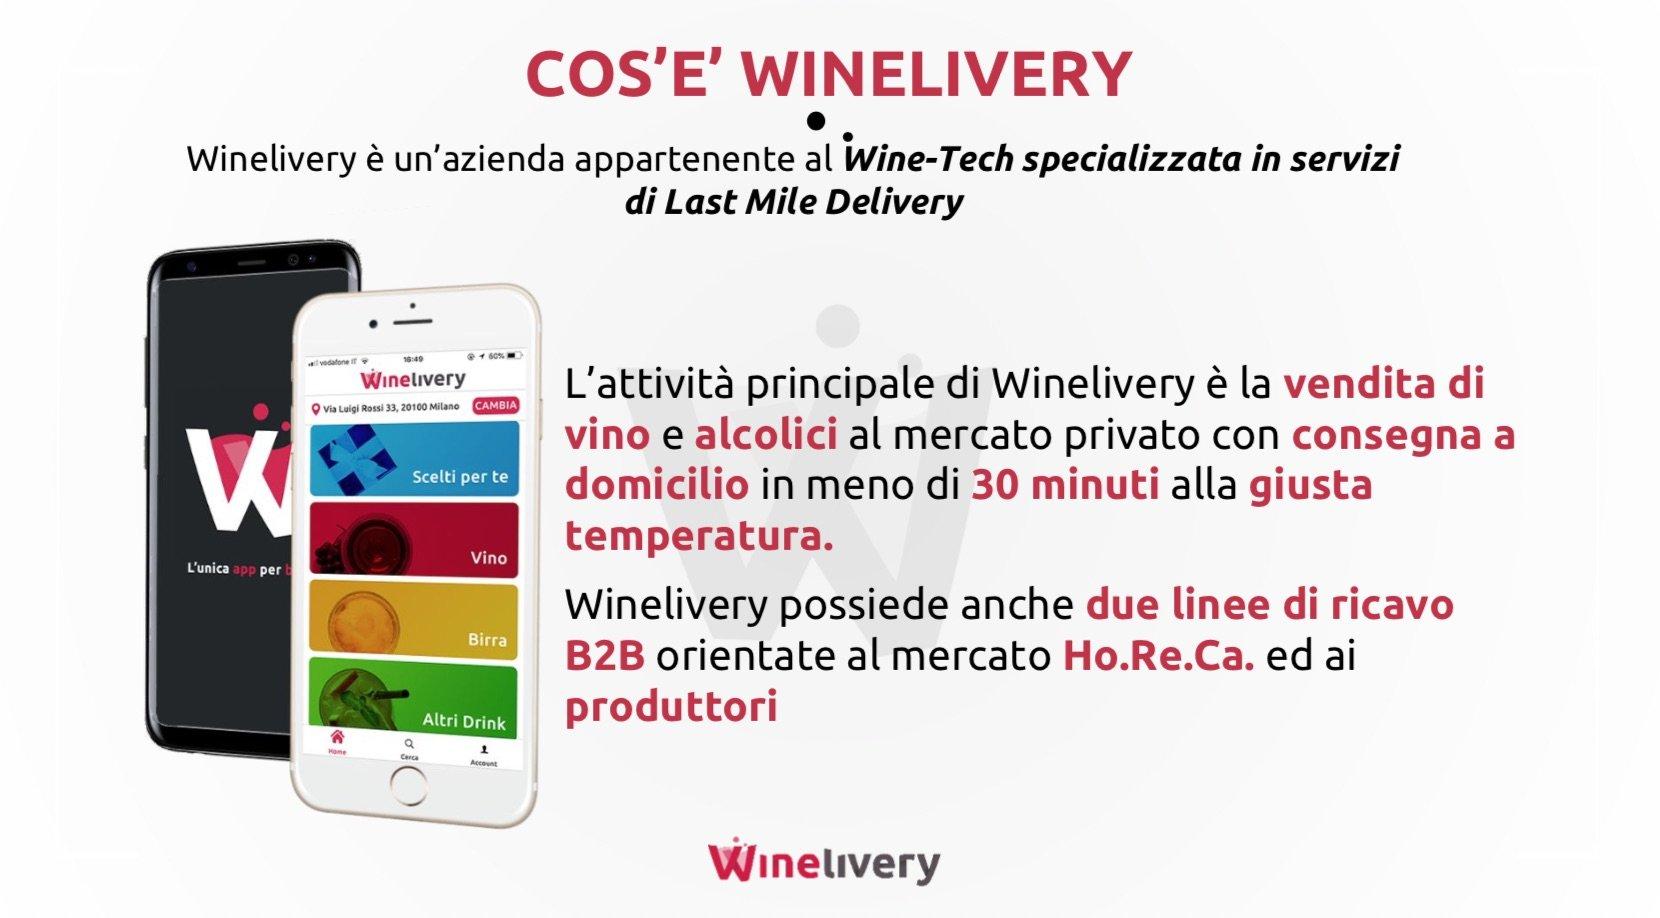 wined1